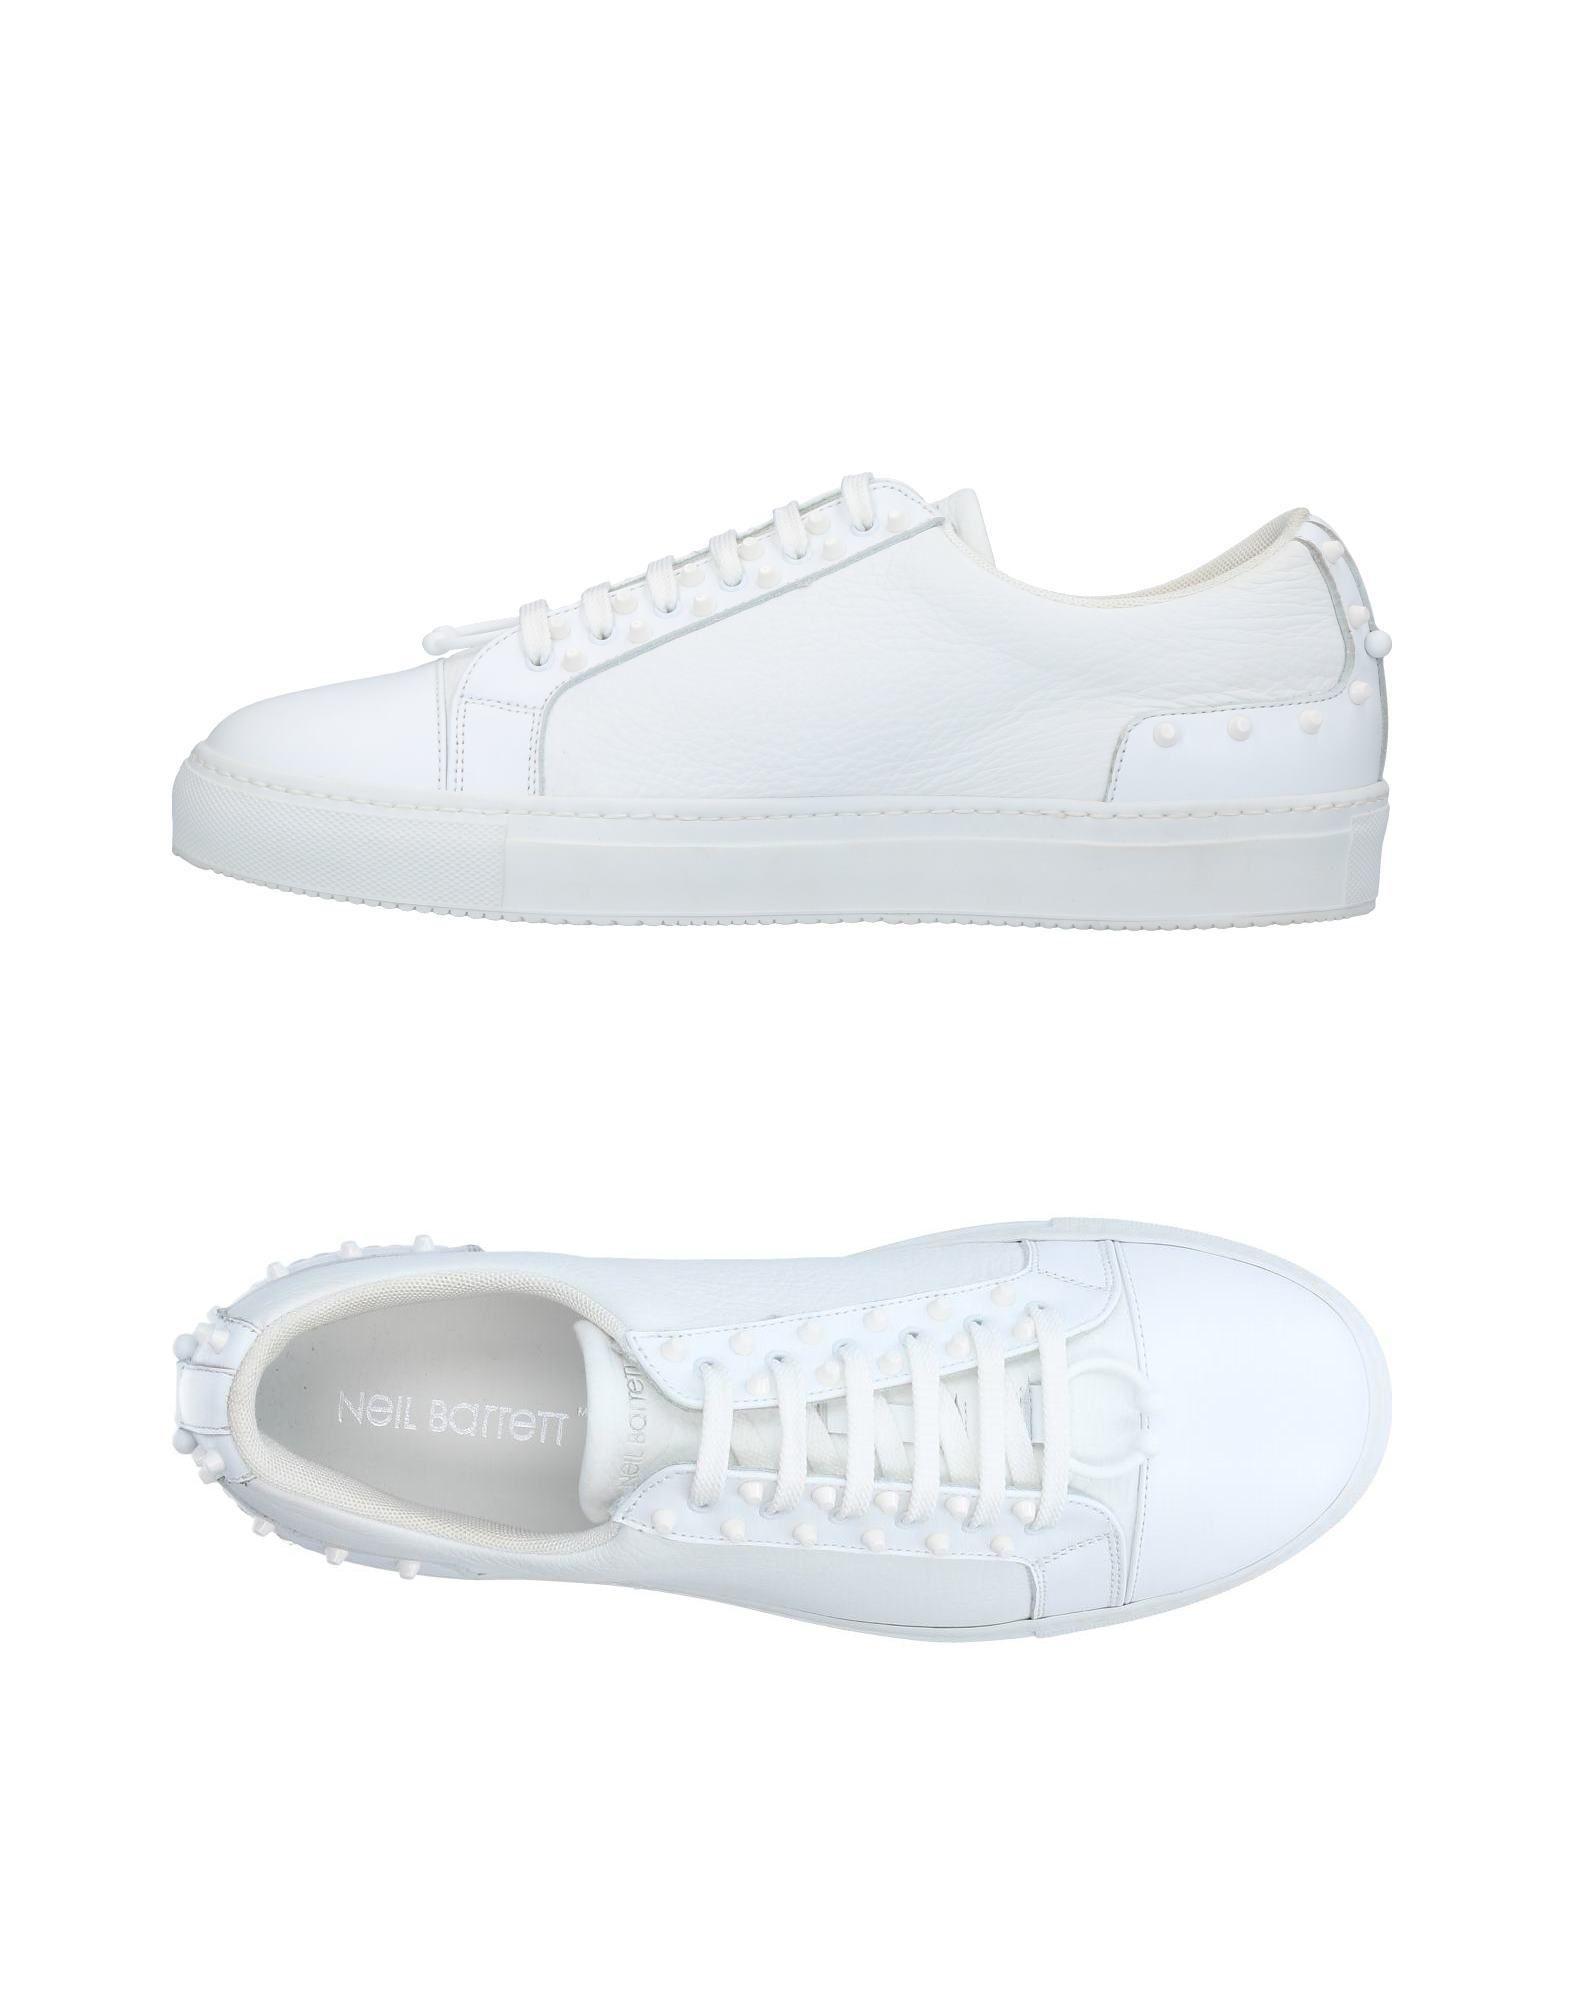 Neil Barrett Sneakers Herren  11364733SE Gute Qualität beliebte Schuhe